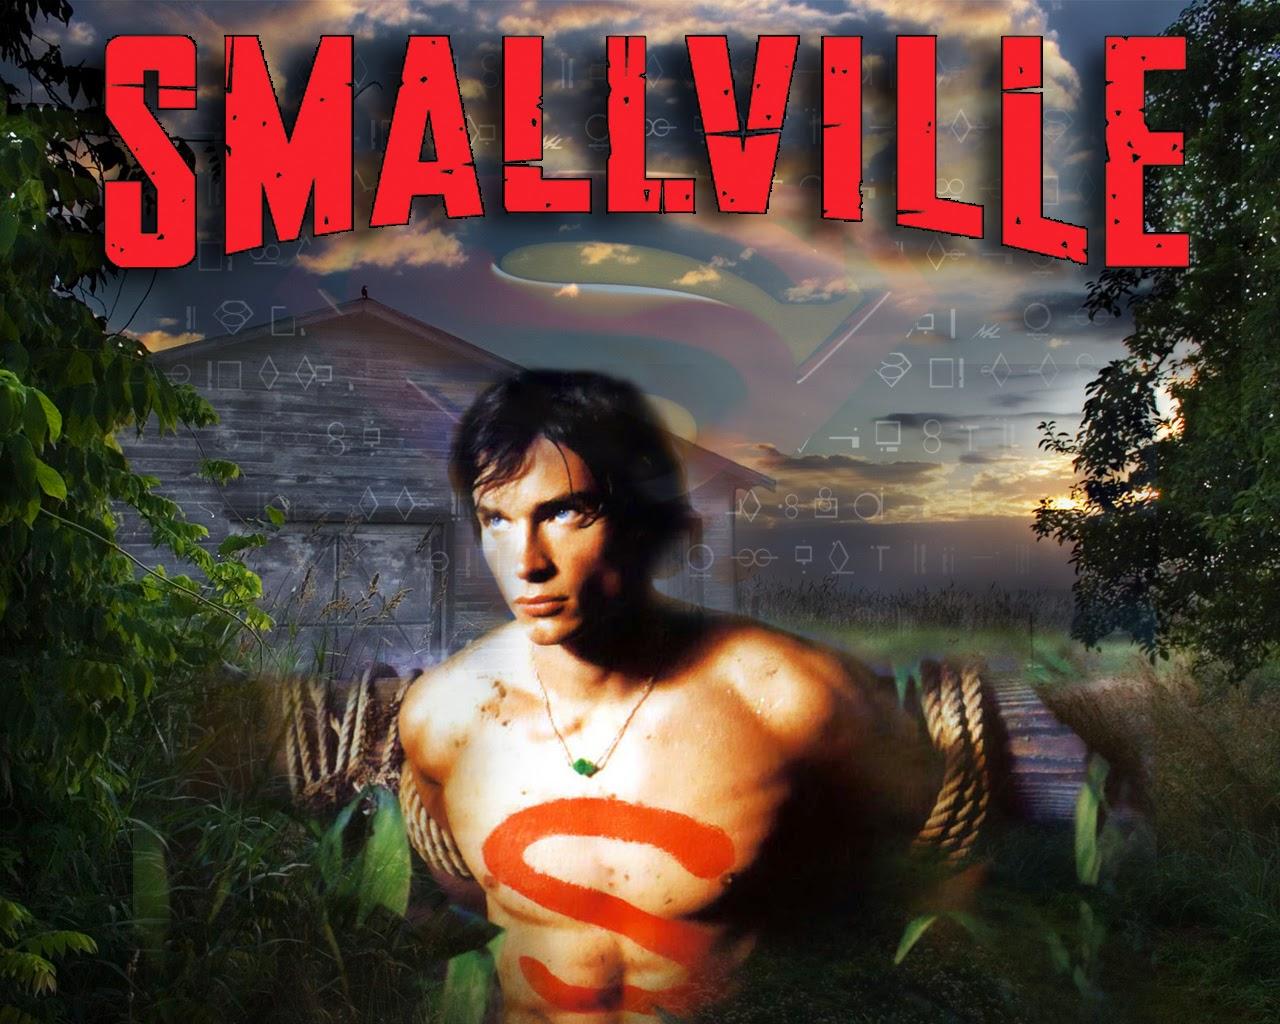 Falling Skies Wallpaper Wallpapers De S 233 Ries Wallpapers Smallville Papeis De